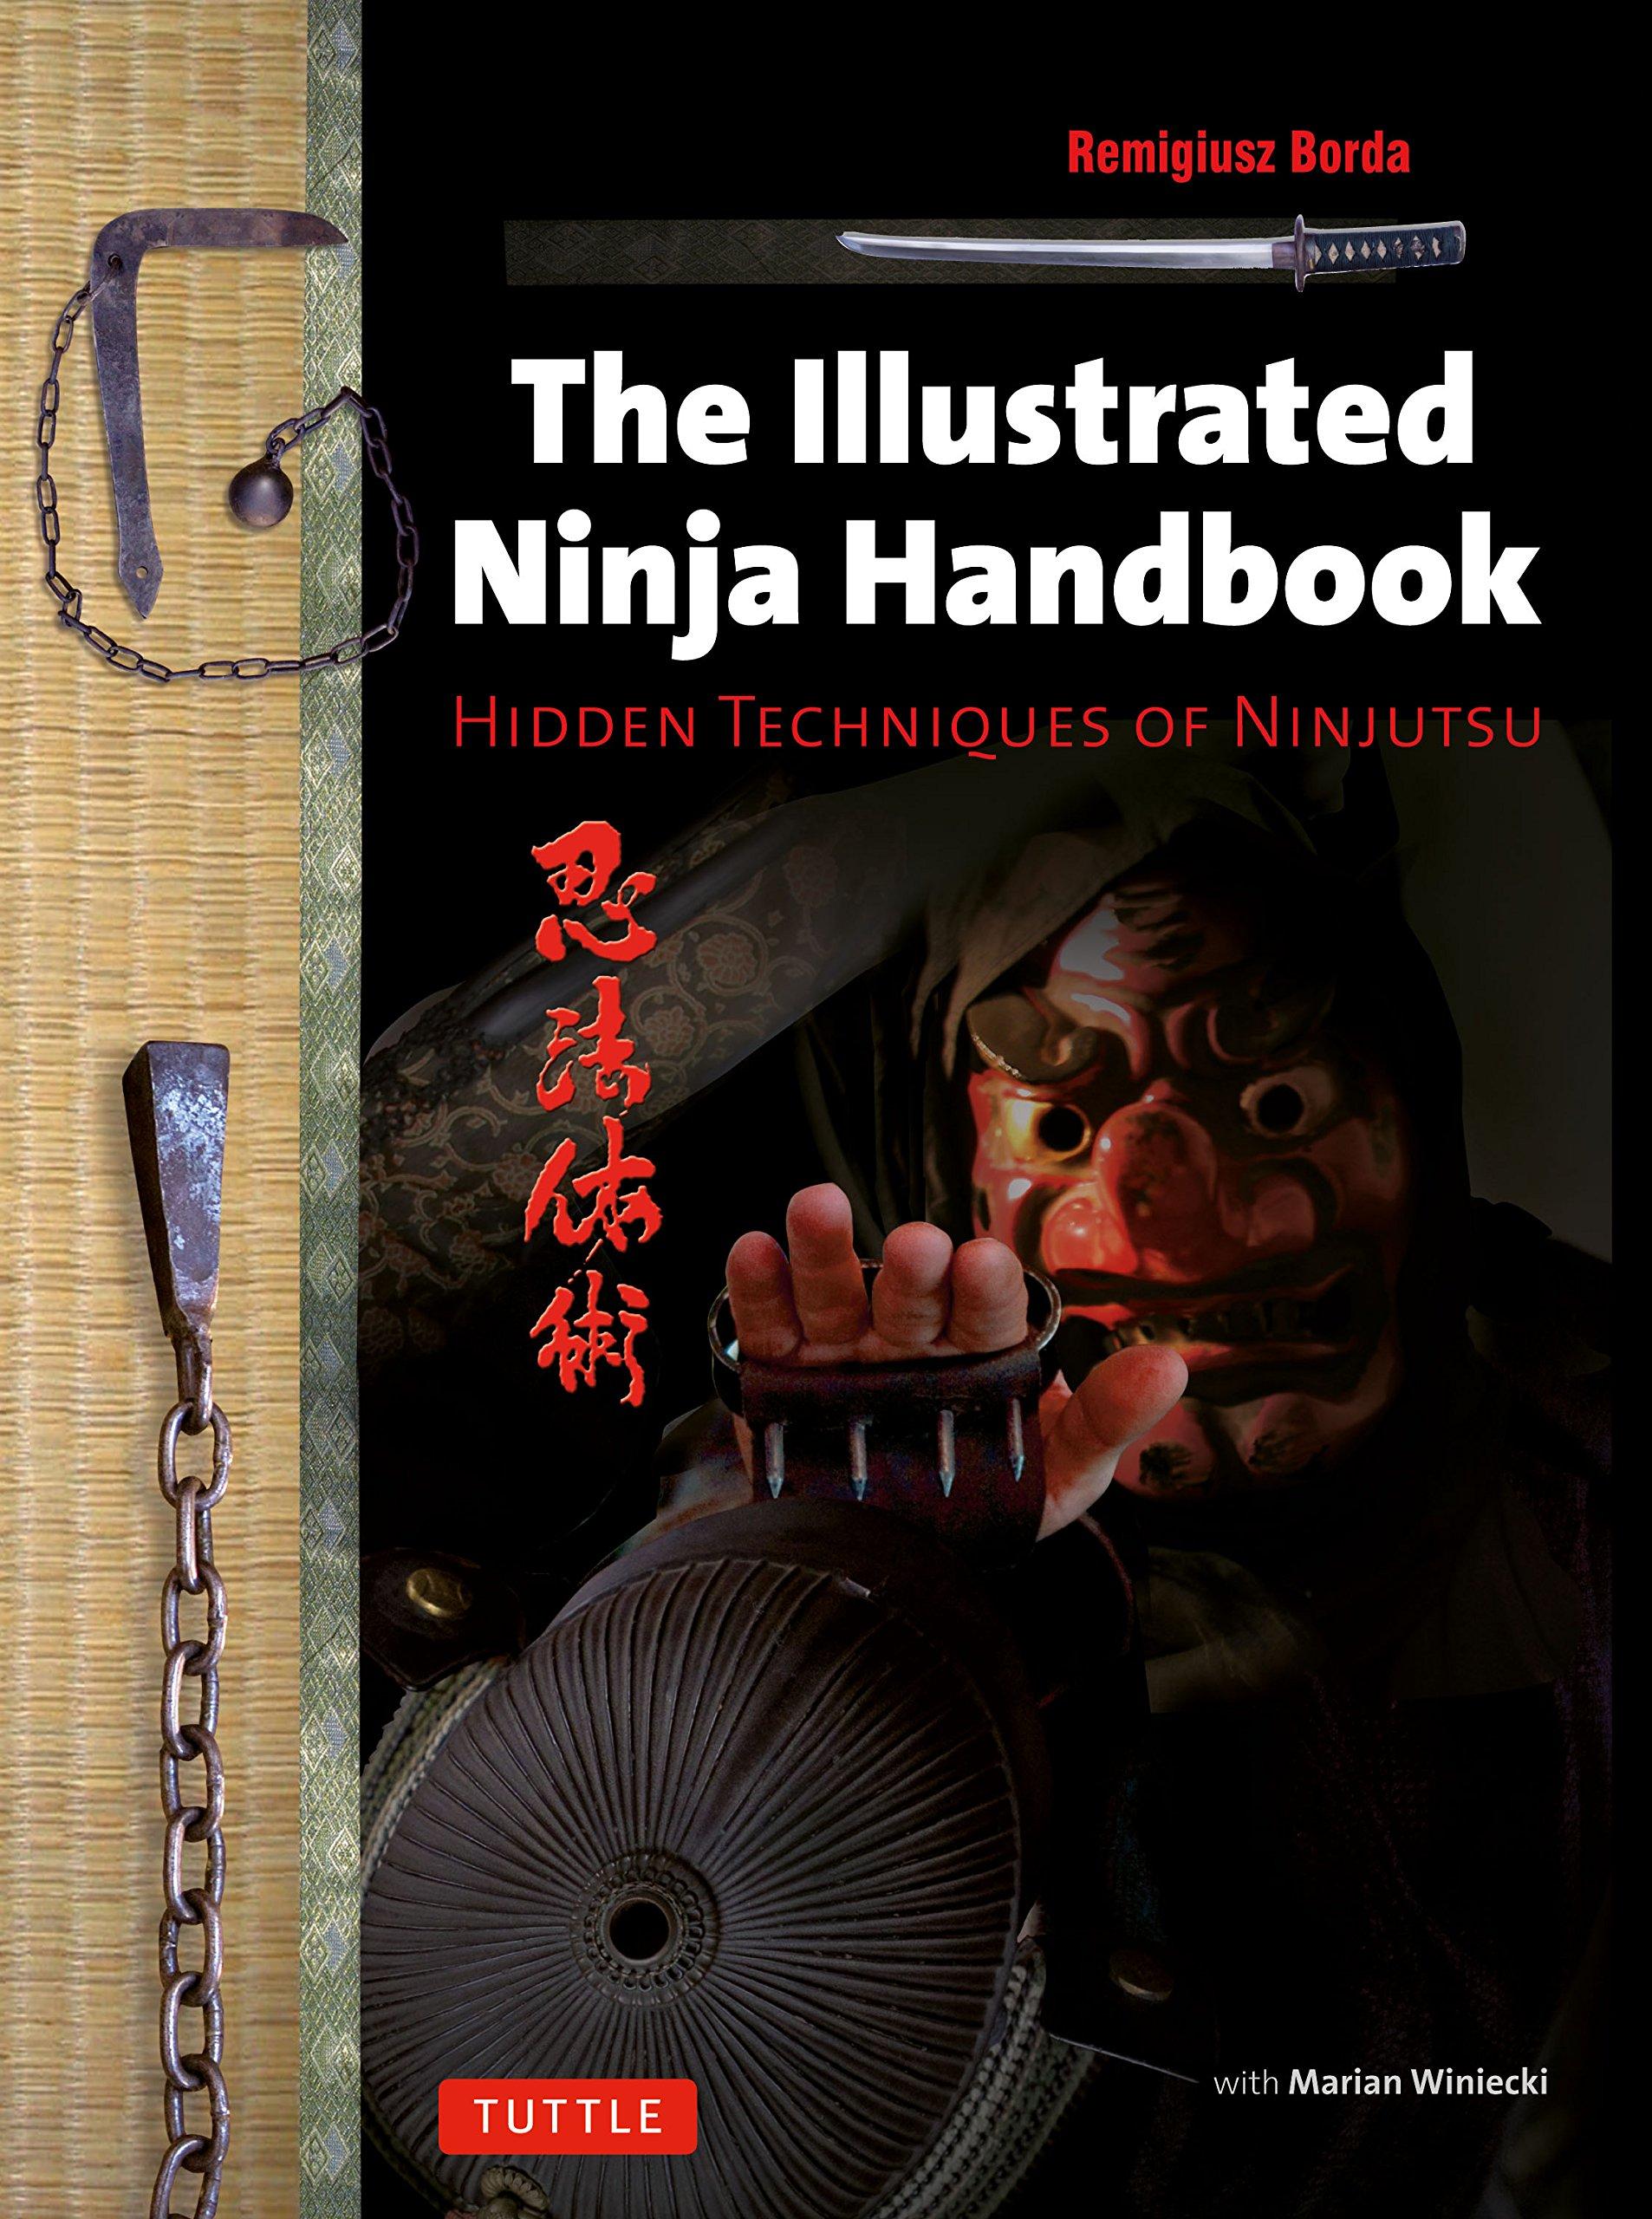 The Illustrated Ninja Handbook: Hidden Techniques of Ninjutsu: Remigiusz  Borda, Marian Winiecki: 9784805313053: Amazon.com: Books